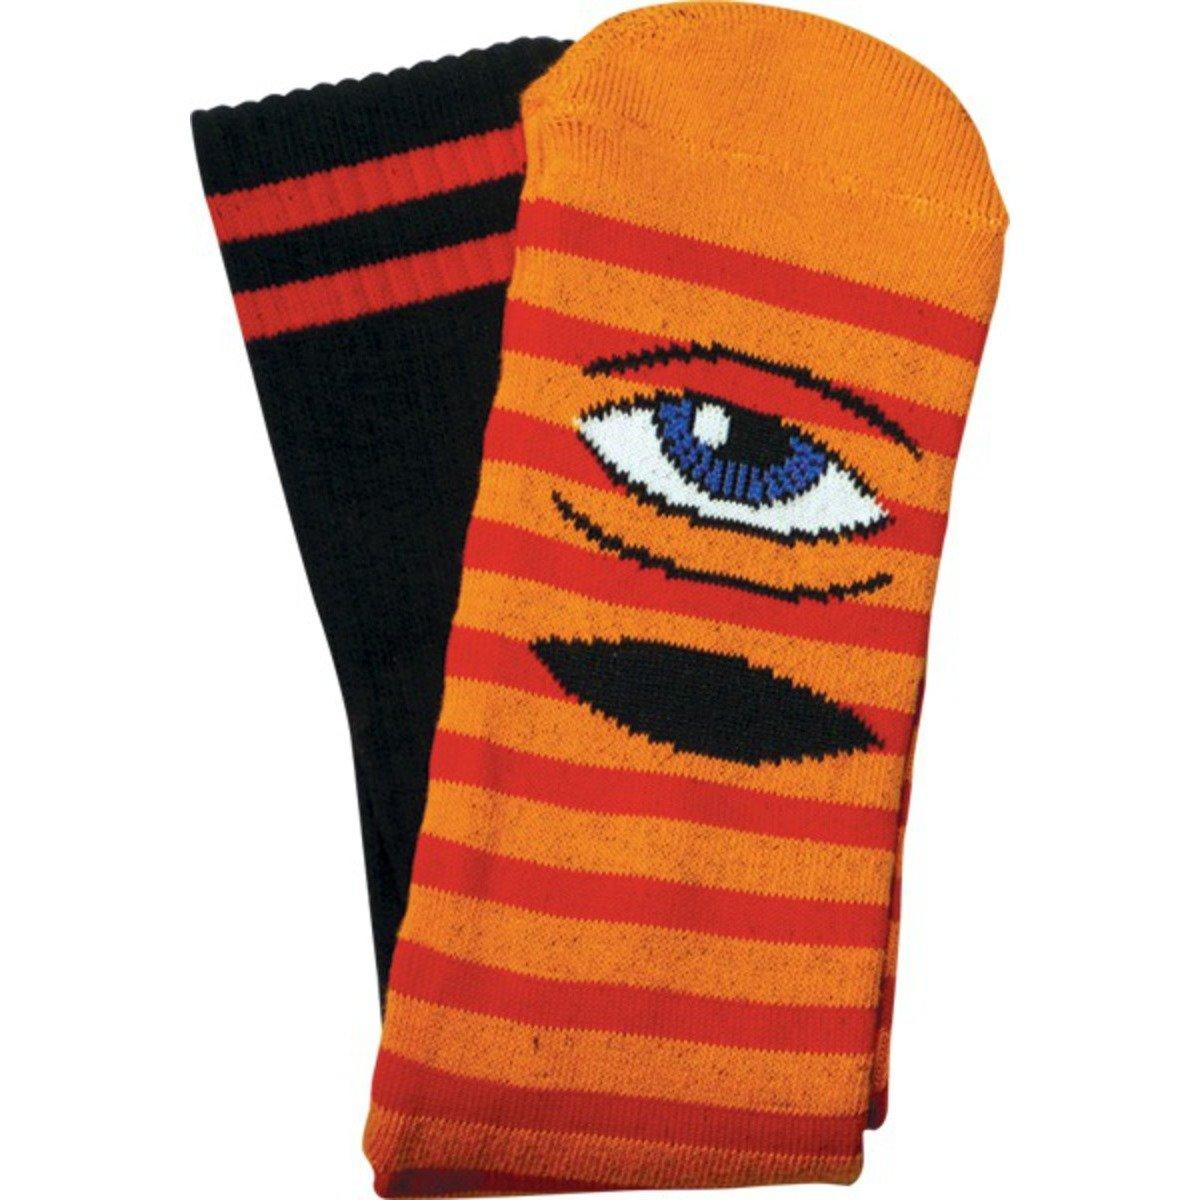 Toy Machine Sect Eye Stripe Crew Socks Orange Red Black 1 Pair Skate Socks